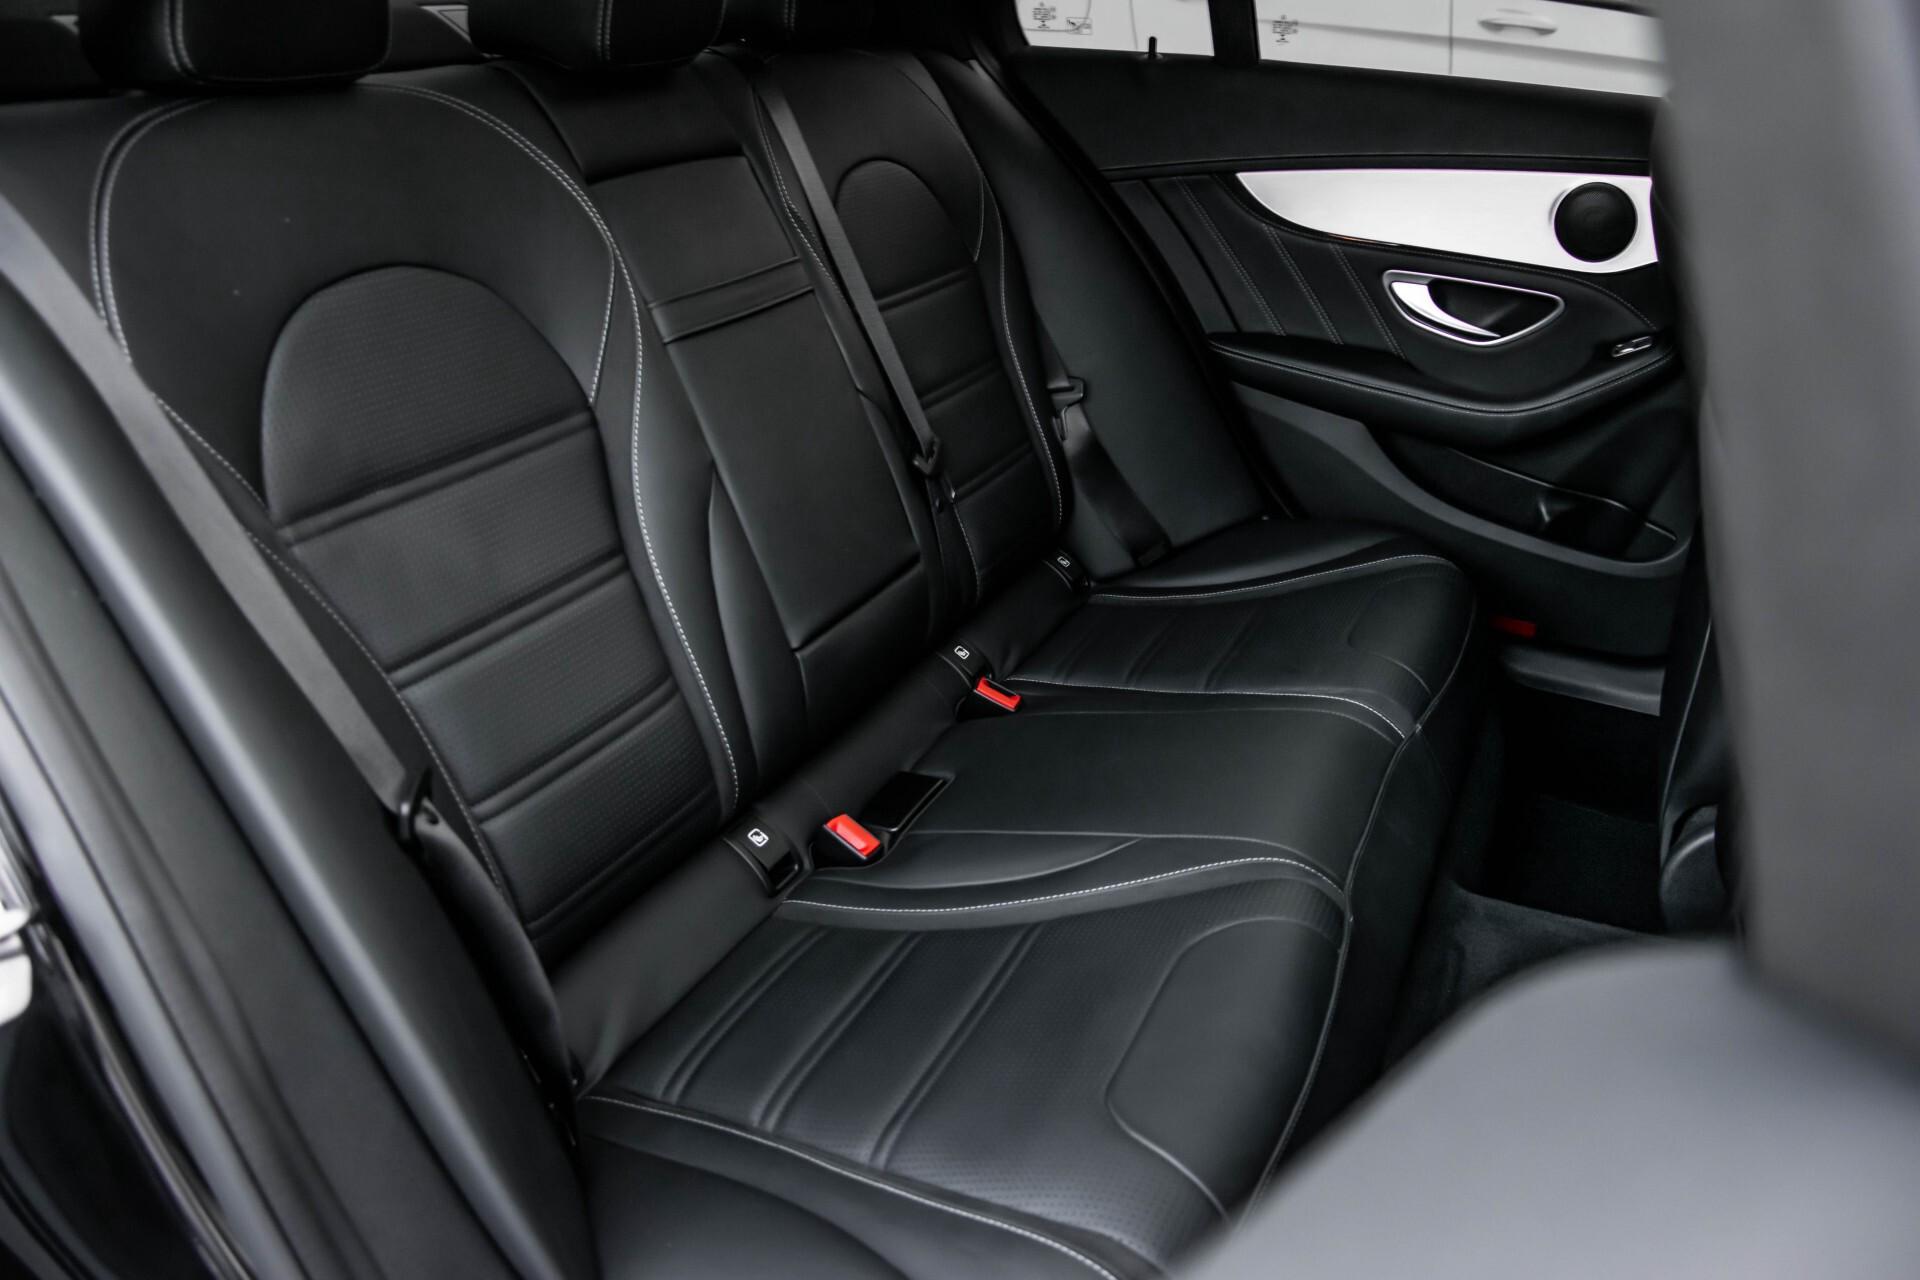 Mercedes-Benz C-Klasse 63 AMG S Panorama/Distronic/Keyless/Comand/Camera/ILS Aut7 Foto 4